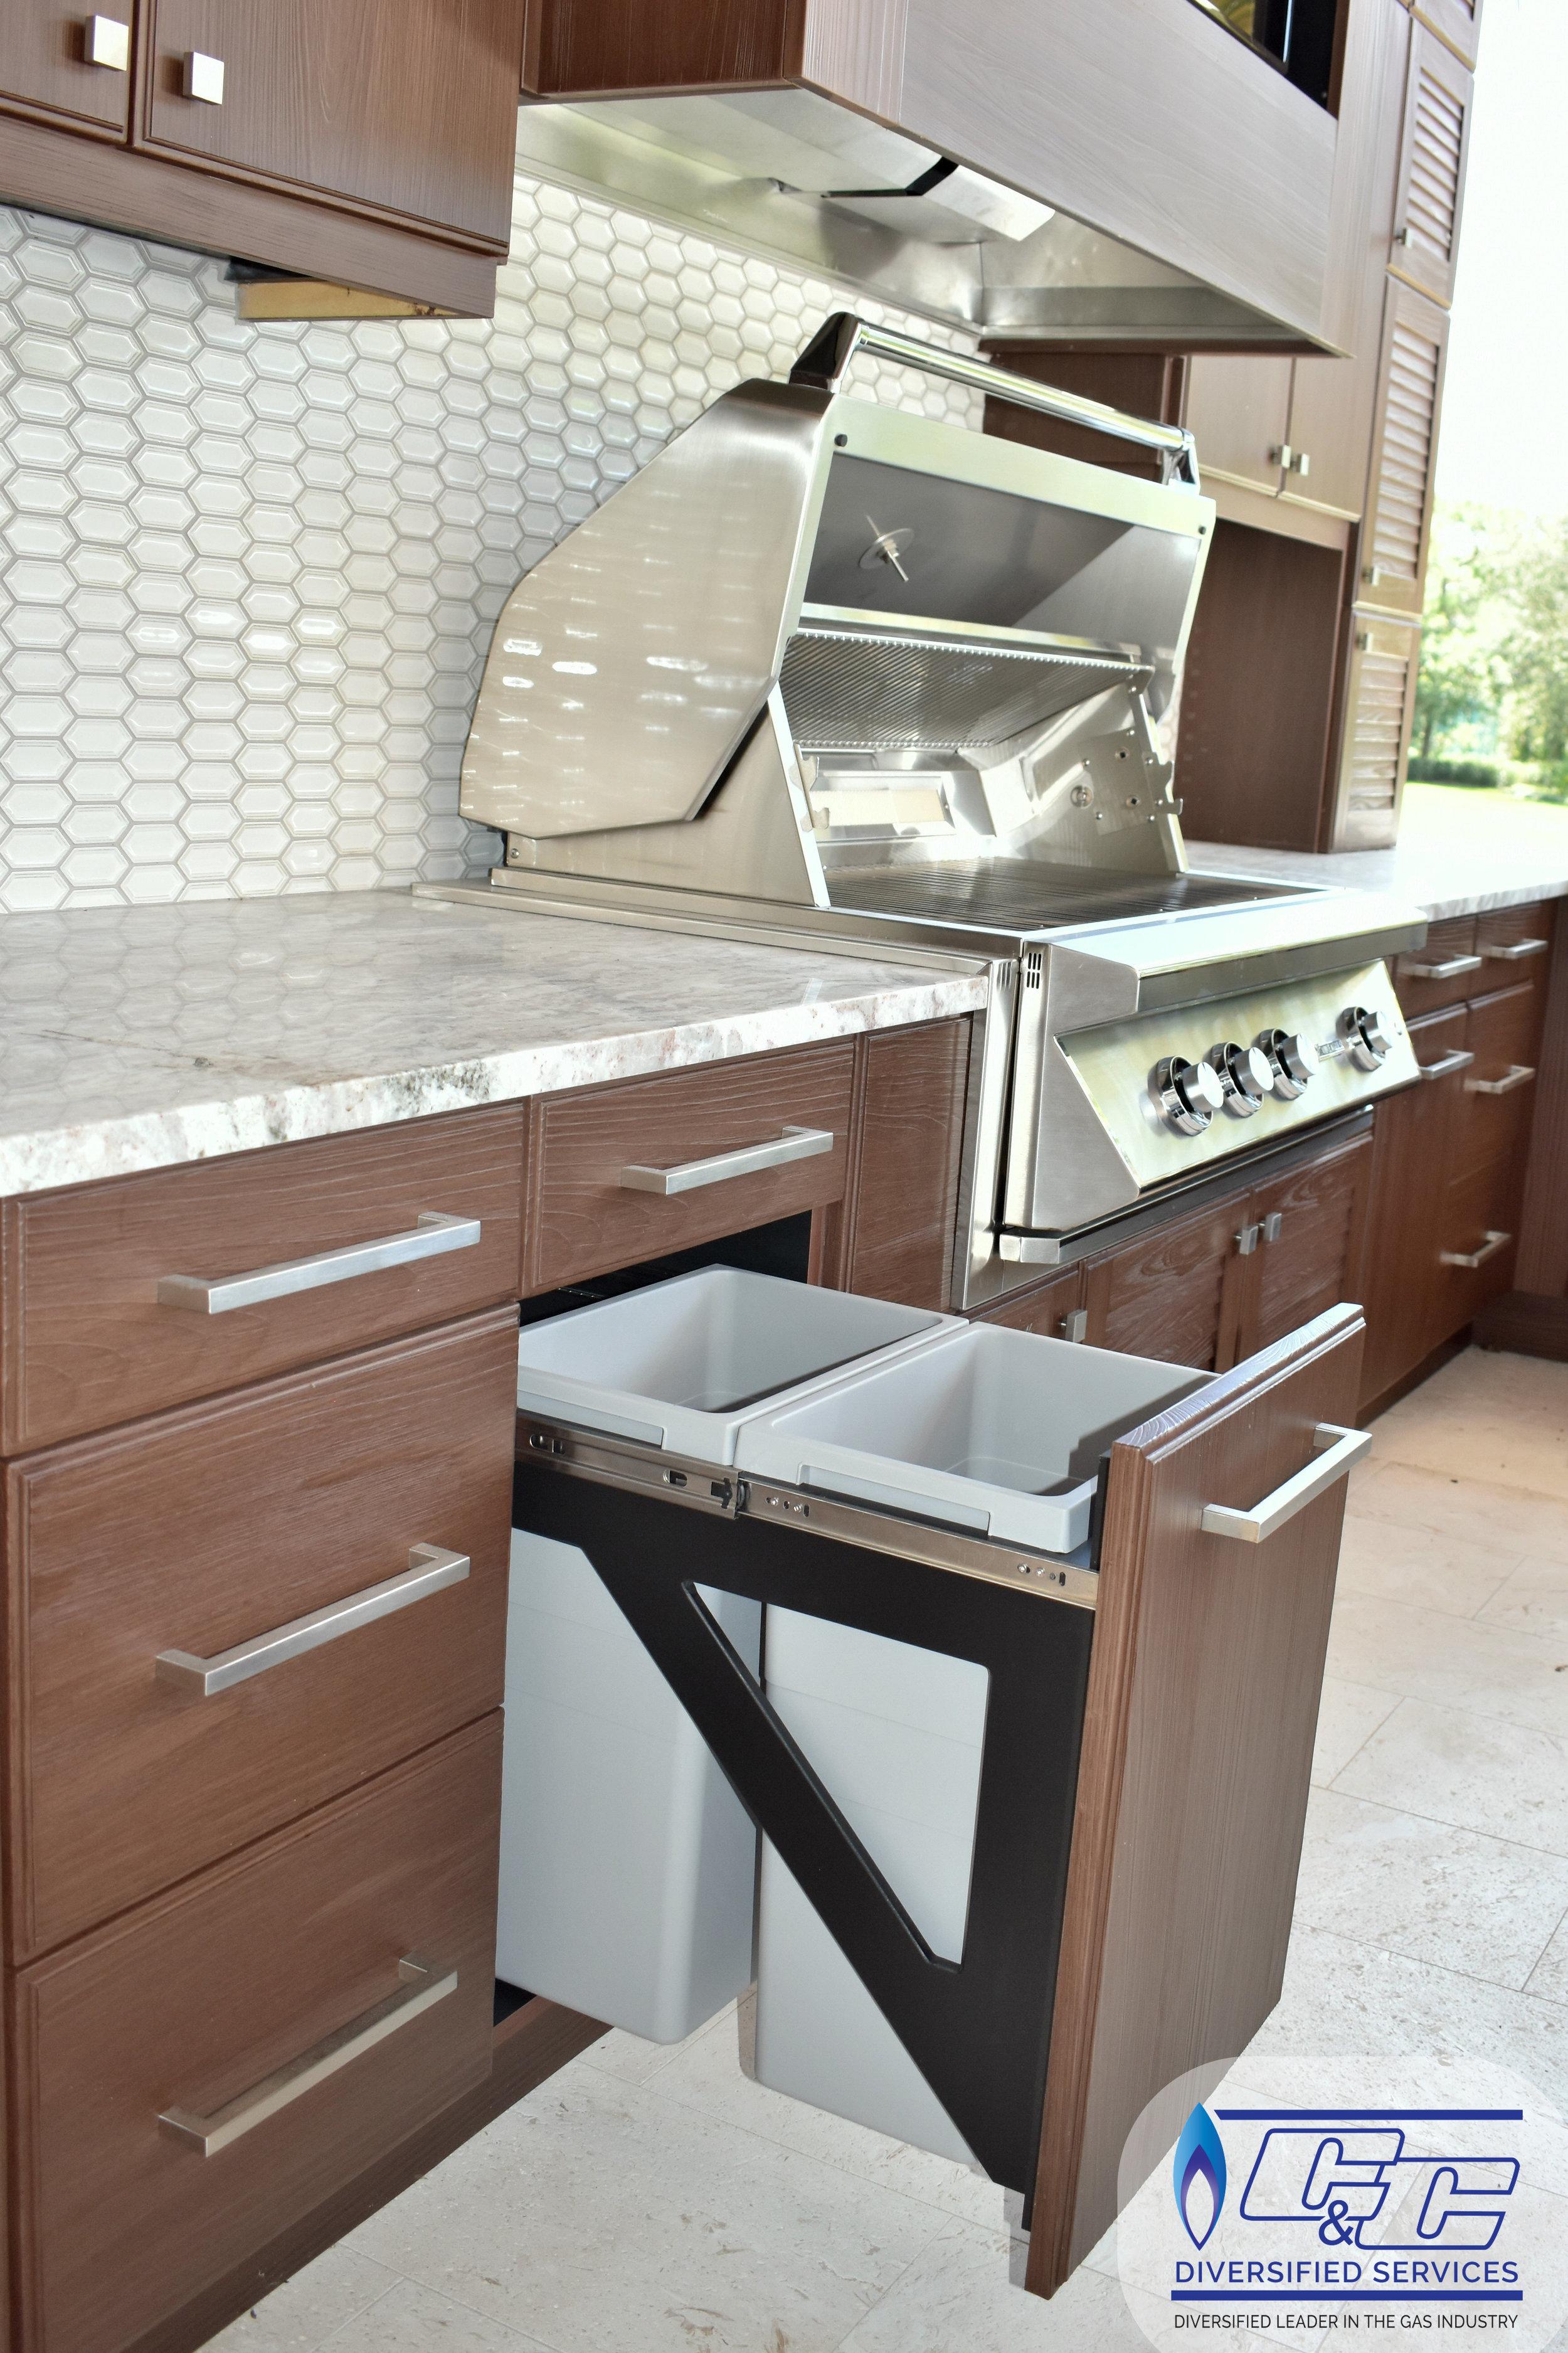 NatureKast Weatherproof Cabinetry - Double Waste Bin Cabinets